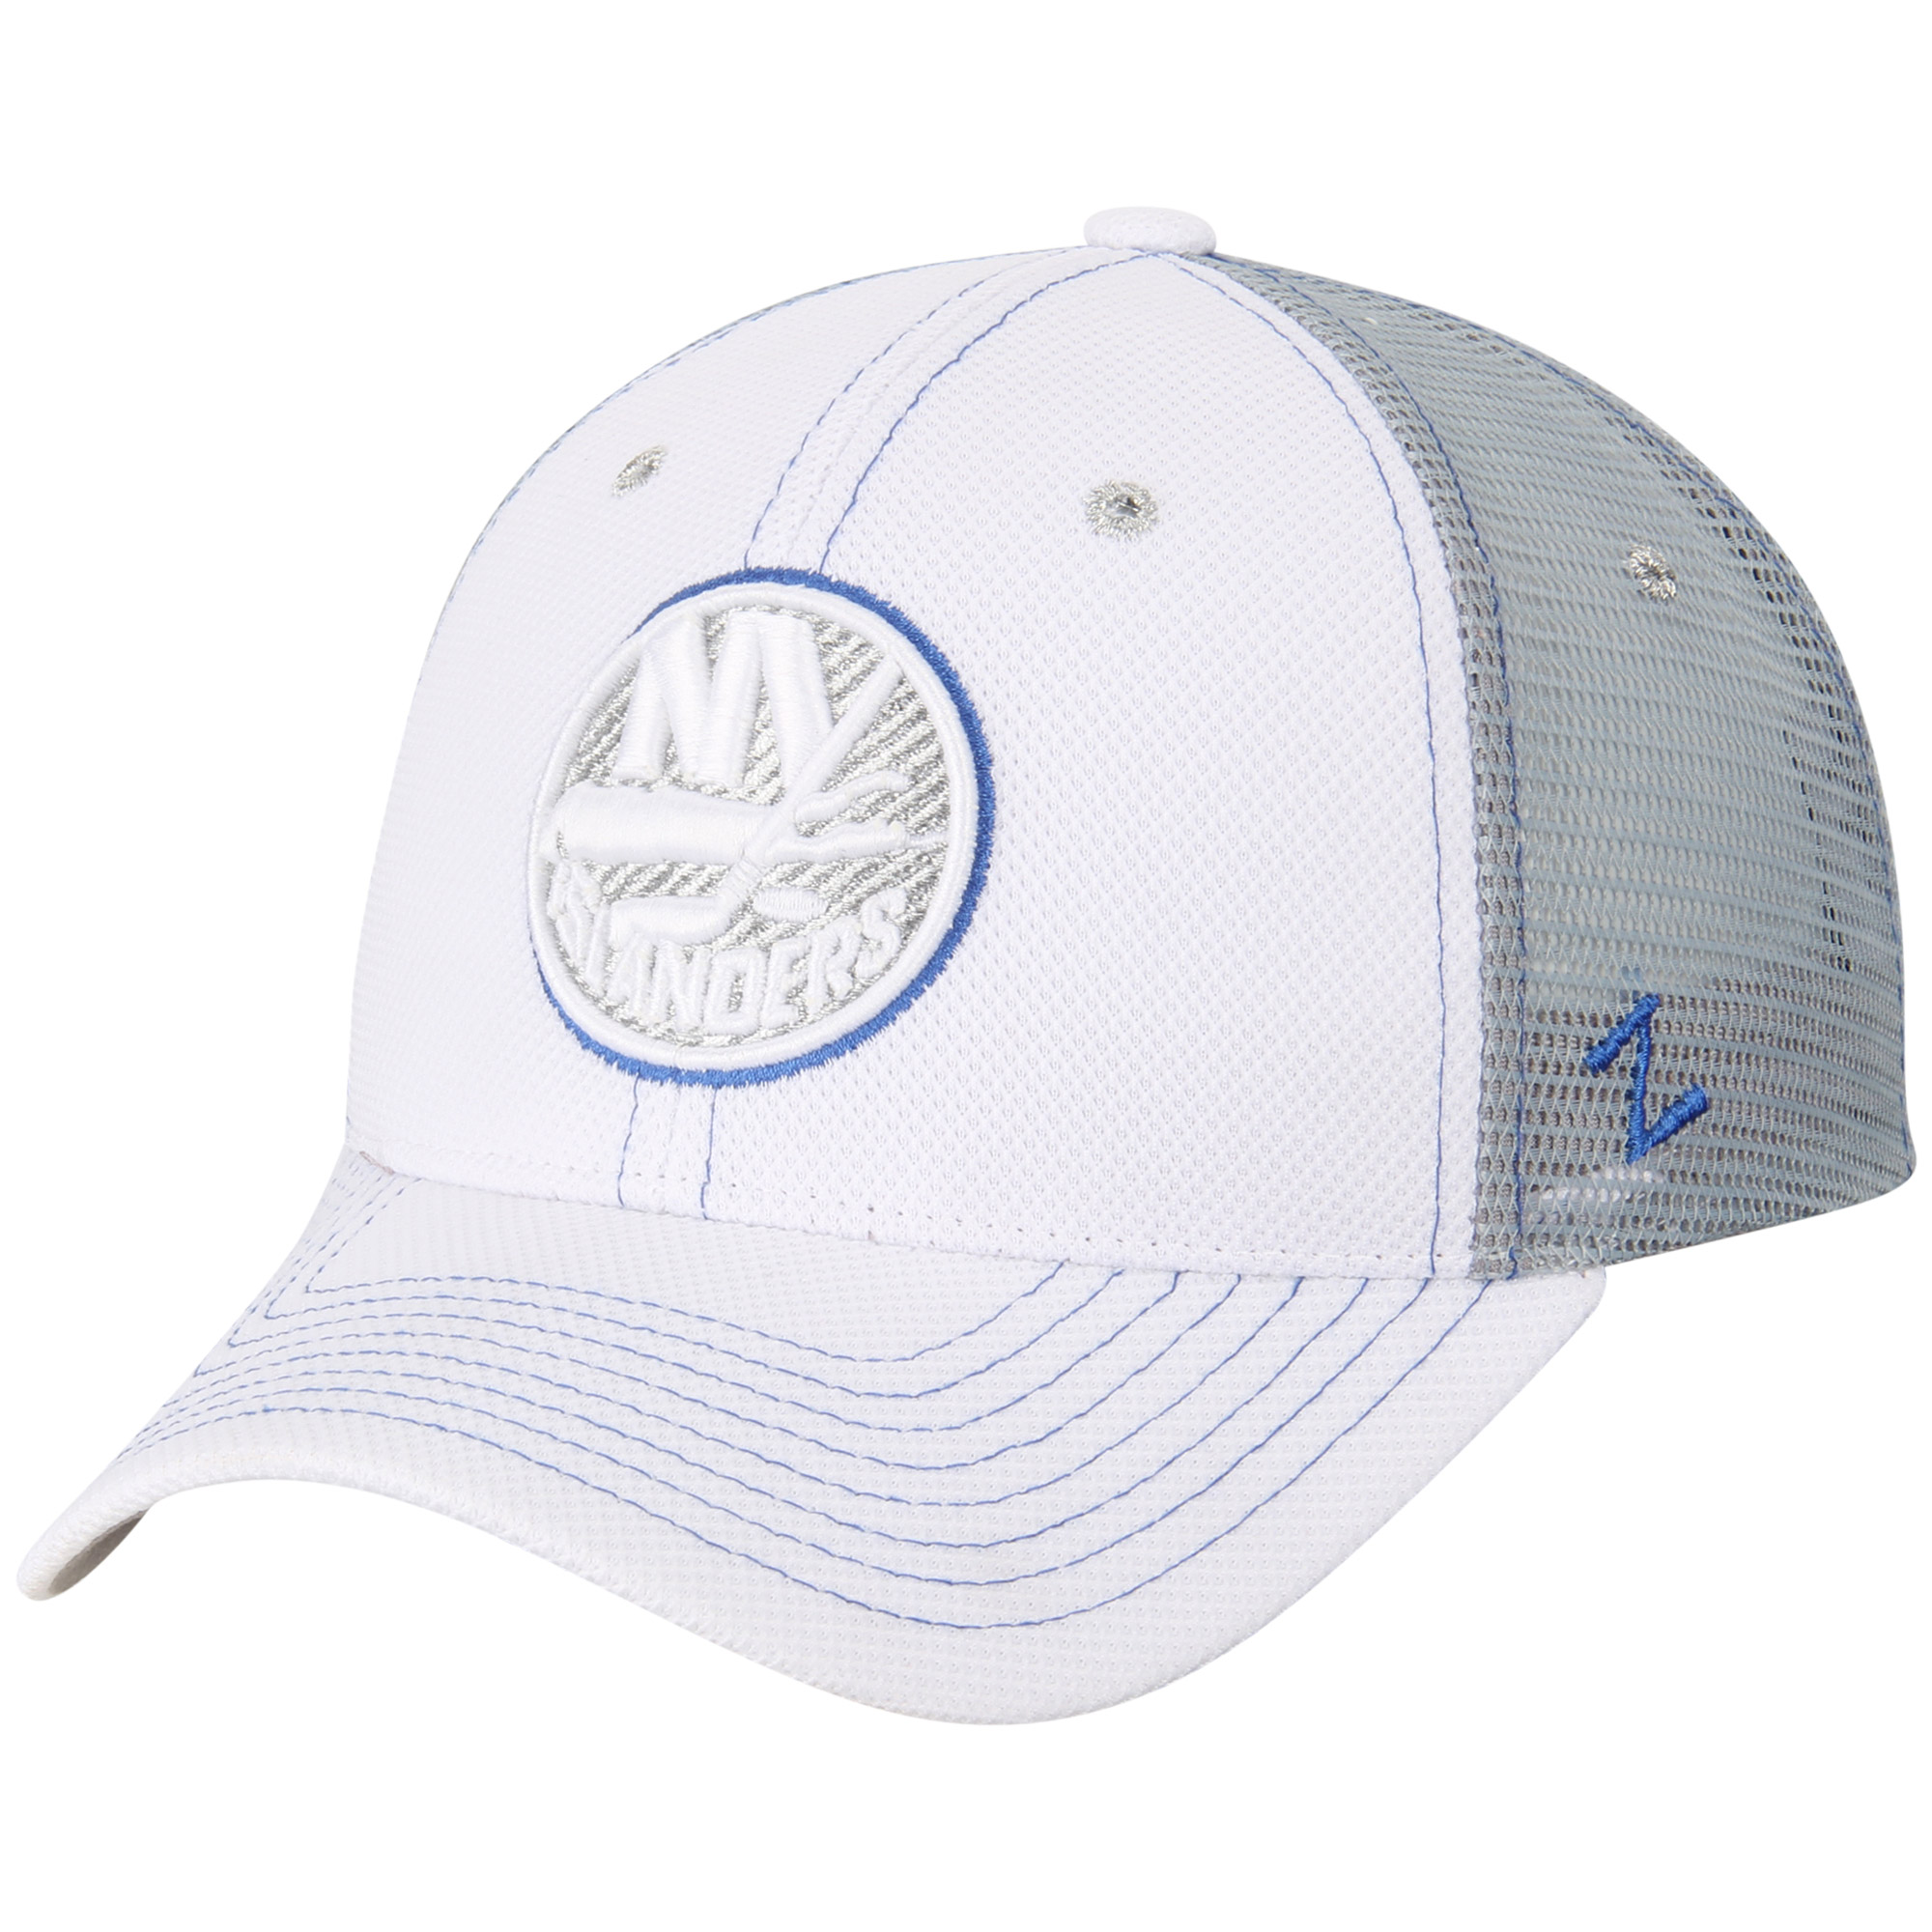 New York Islanders Zephyr Women's Cardio Trucker Snapback Adjustable Hat - White - OSFA